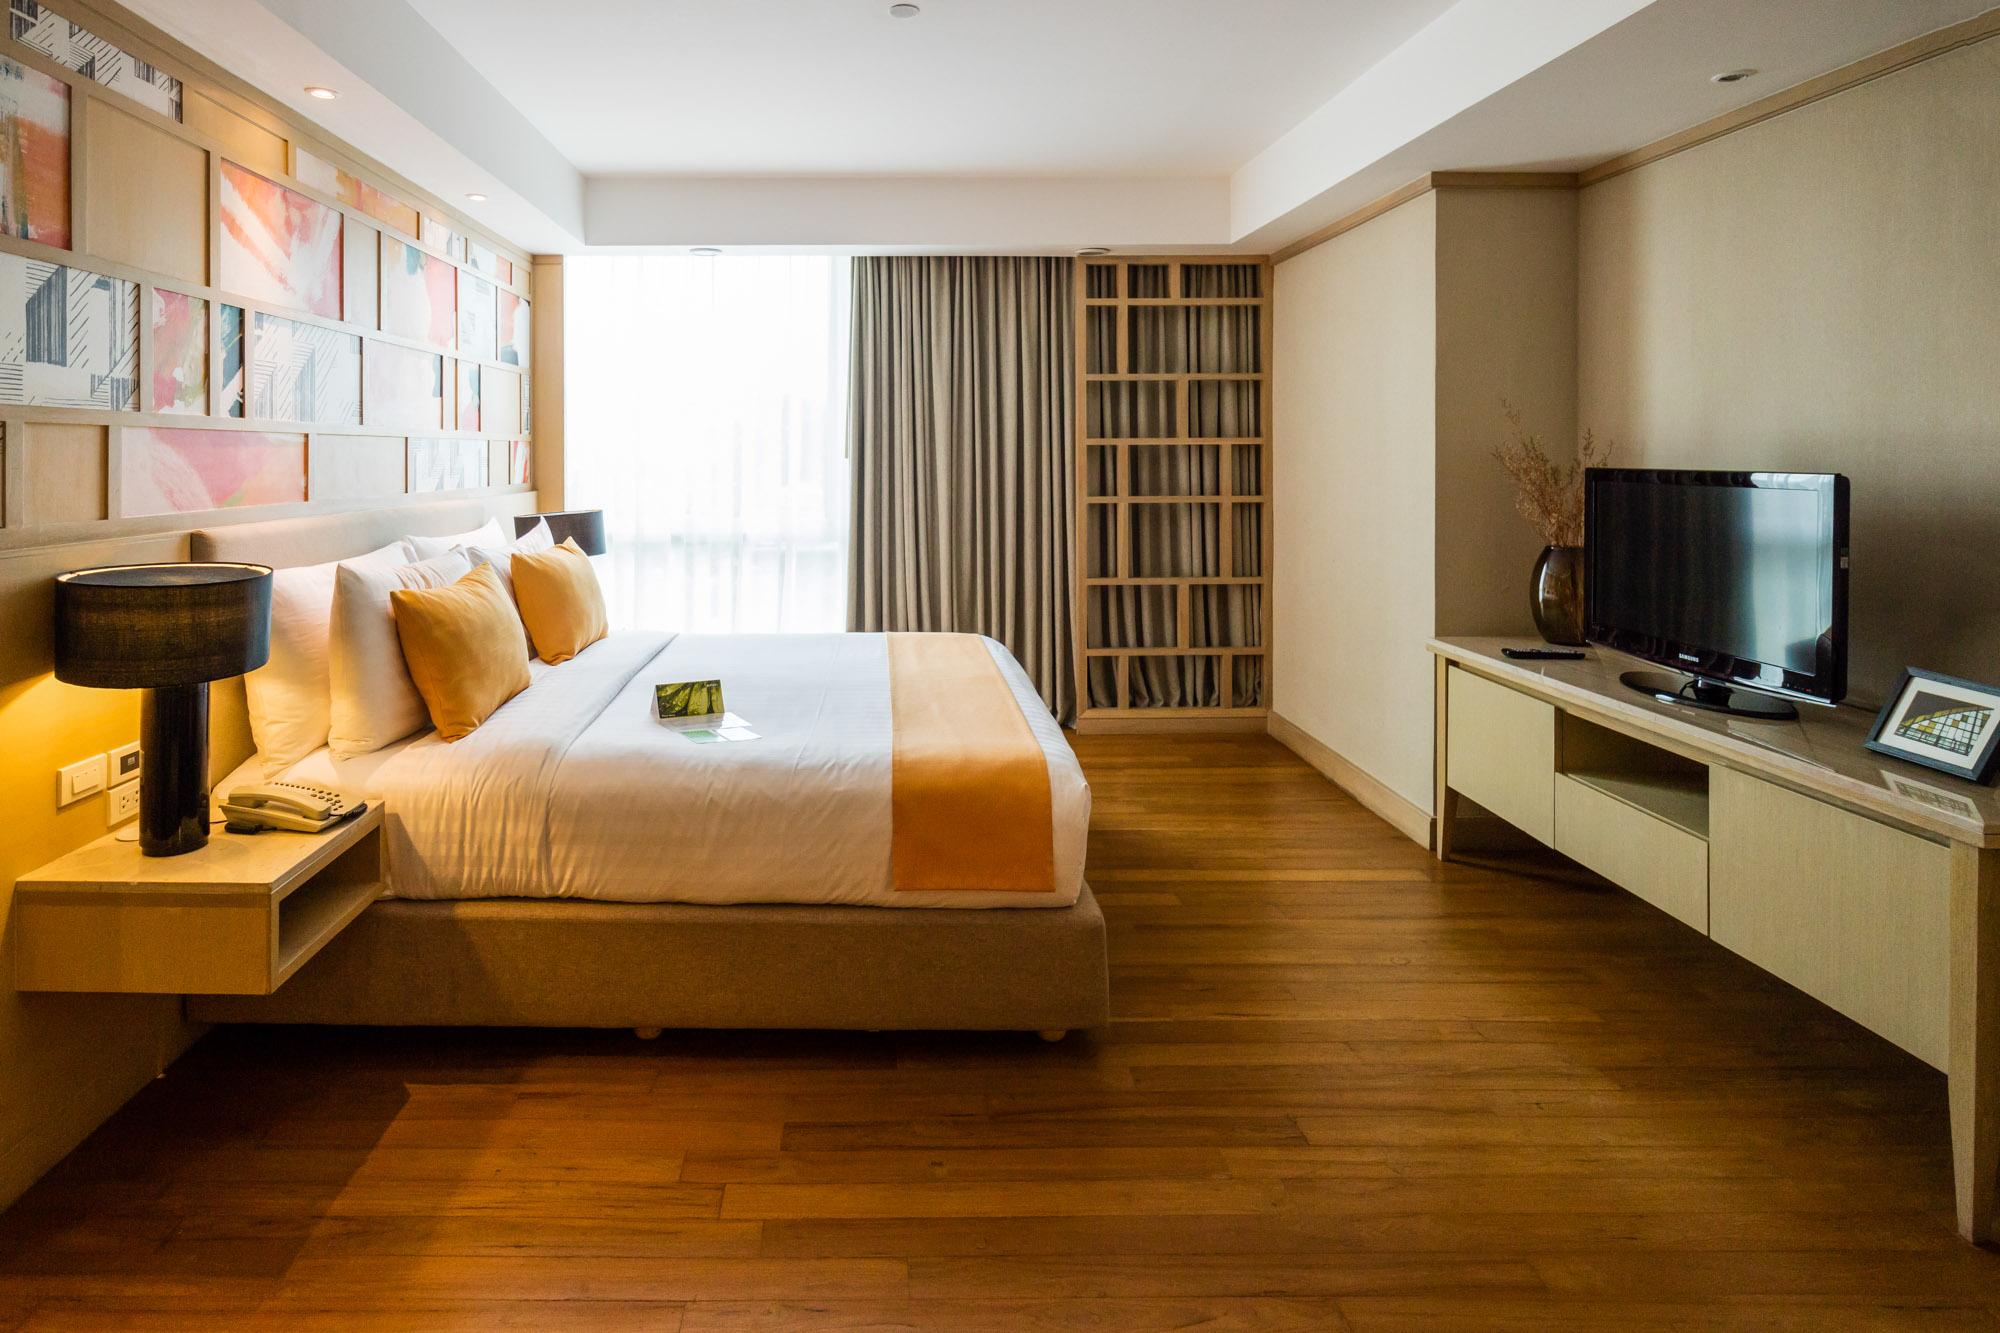 Amari Residences Bangkok - Luxury Serviced Residences  โรงแรม อมารี เรสซิเดนซ์ กรุงเทพฯ Amari Residences Bangkok IMG 6656